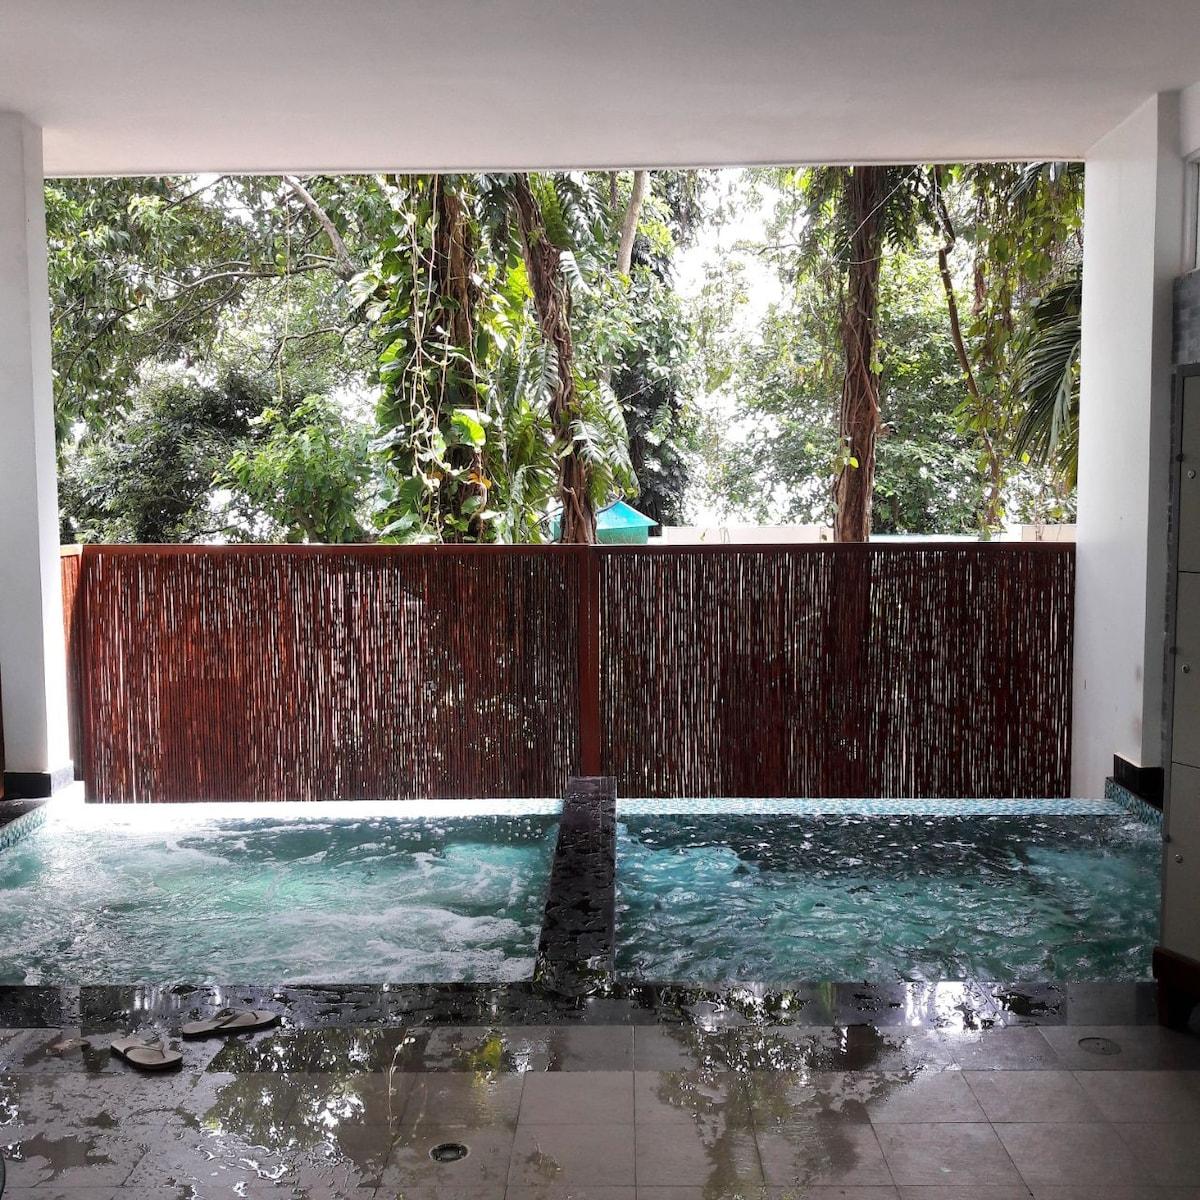 Krong Preah Sihanouk 2017: Krong Preah Sihanouk Orlofseignir Og  Skammtímaleiga   Airbnb Krong Preah Sihanouk, Sihanoukville, Kambódía